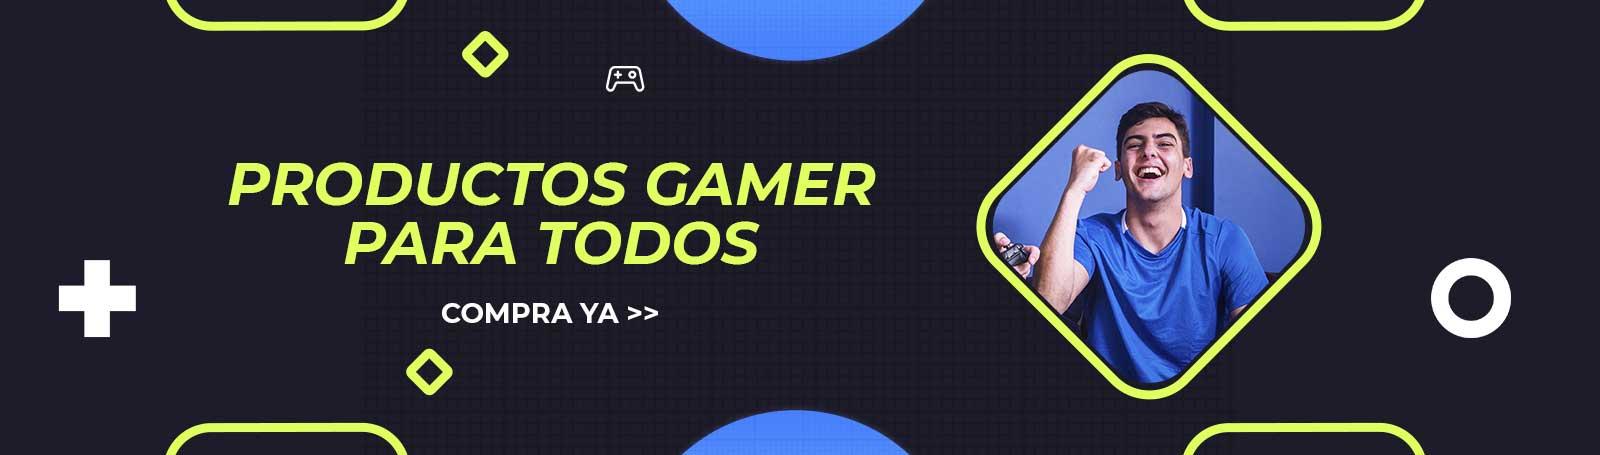 Gamer-para-todos